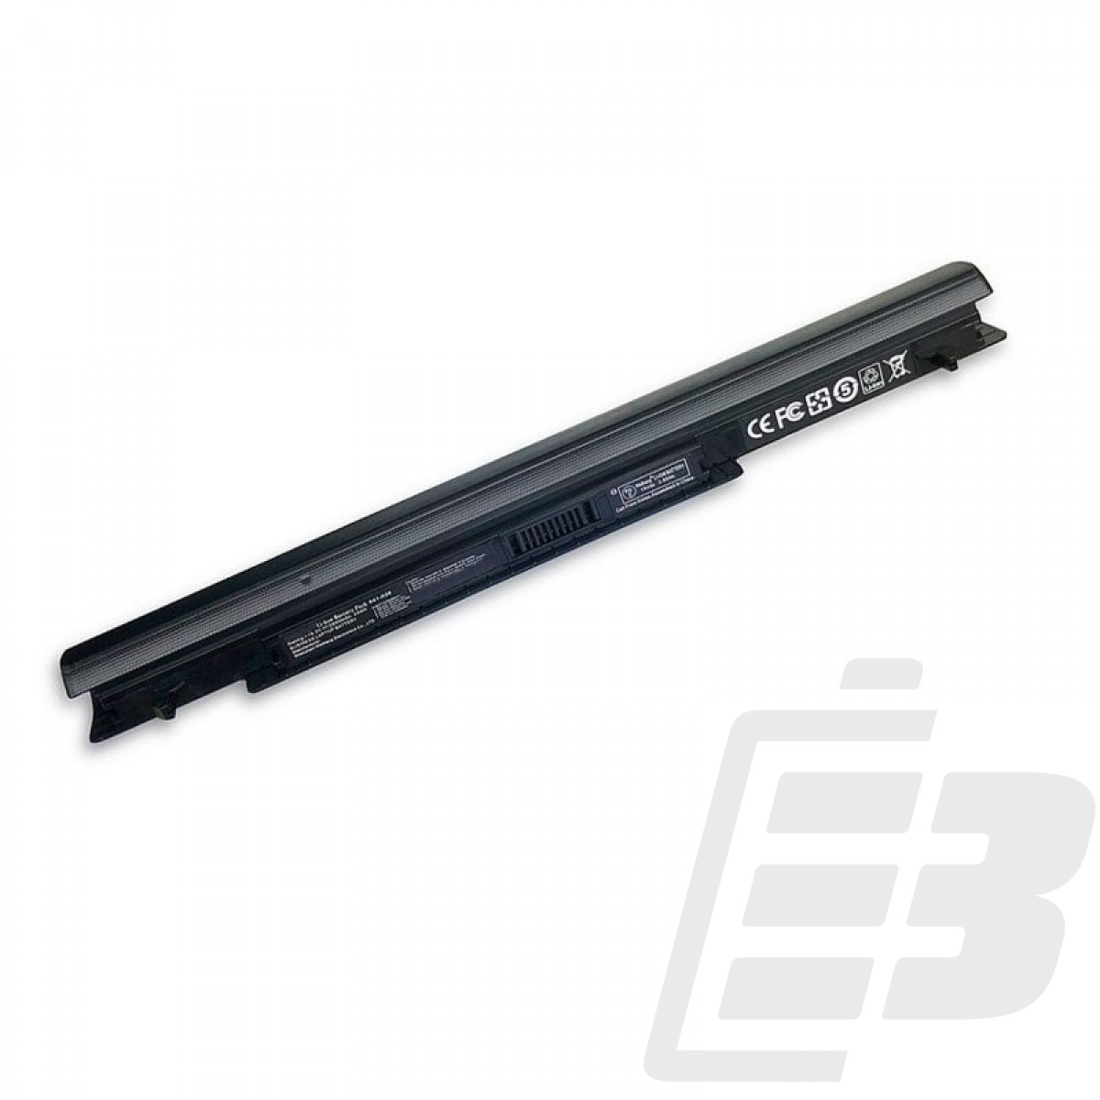 Laptop battery Asus K56_1